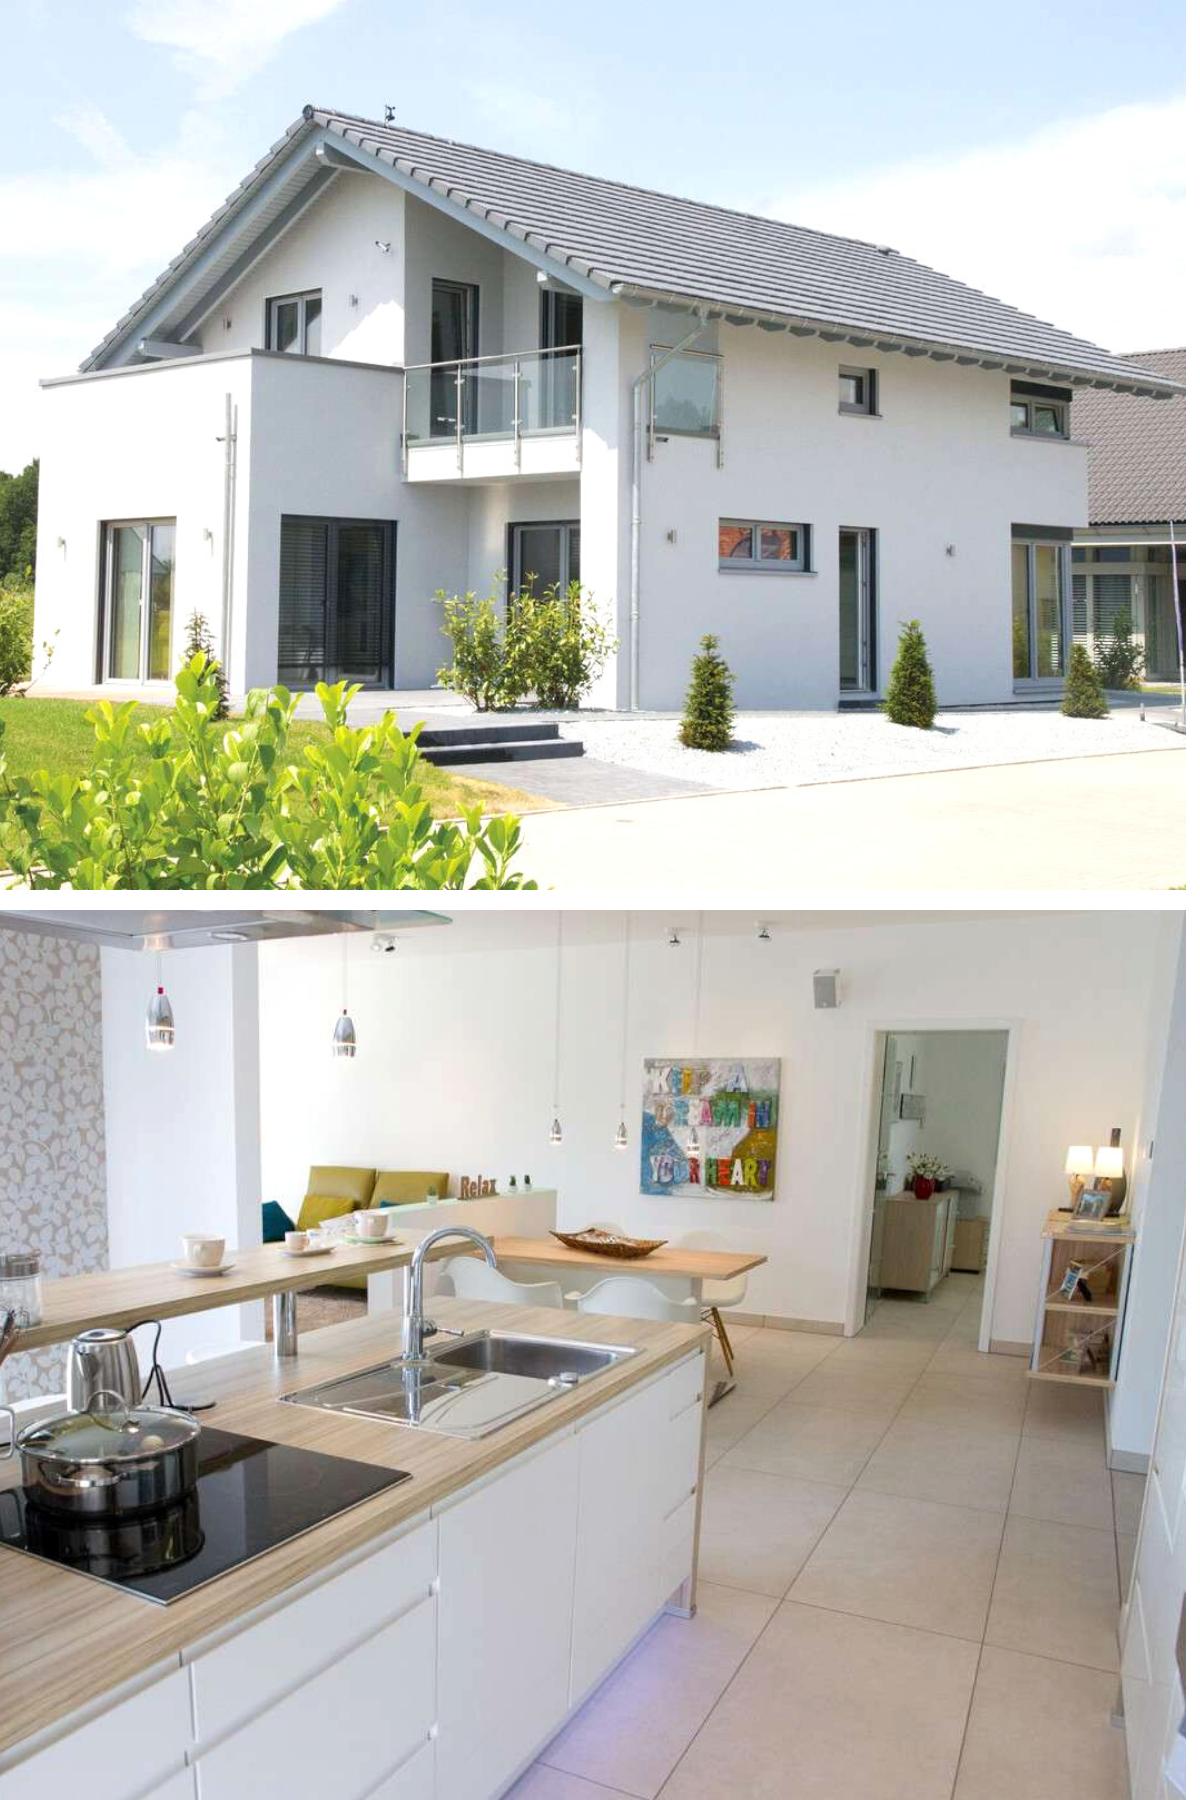 Allkauf Musterhaus Nurnberg Erlangen In 2020 Haus Einfamilienhaus Musterhaus